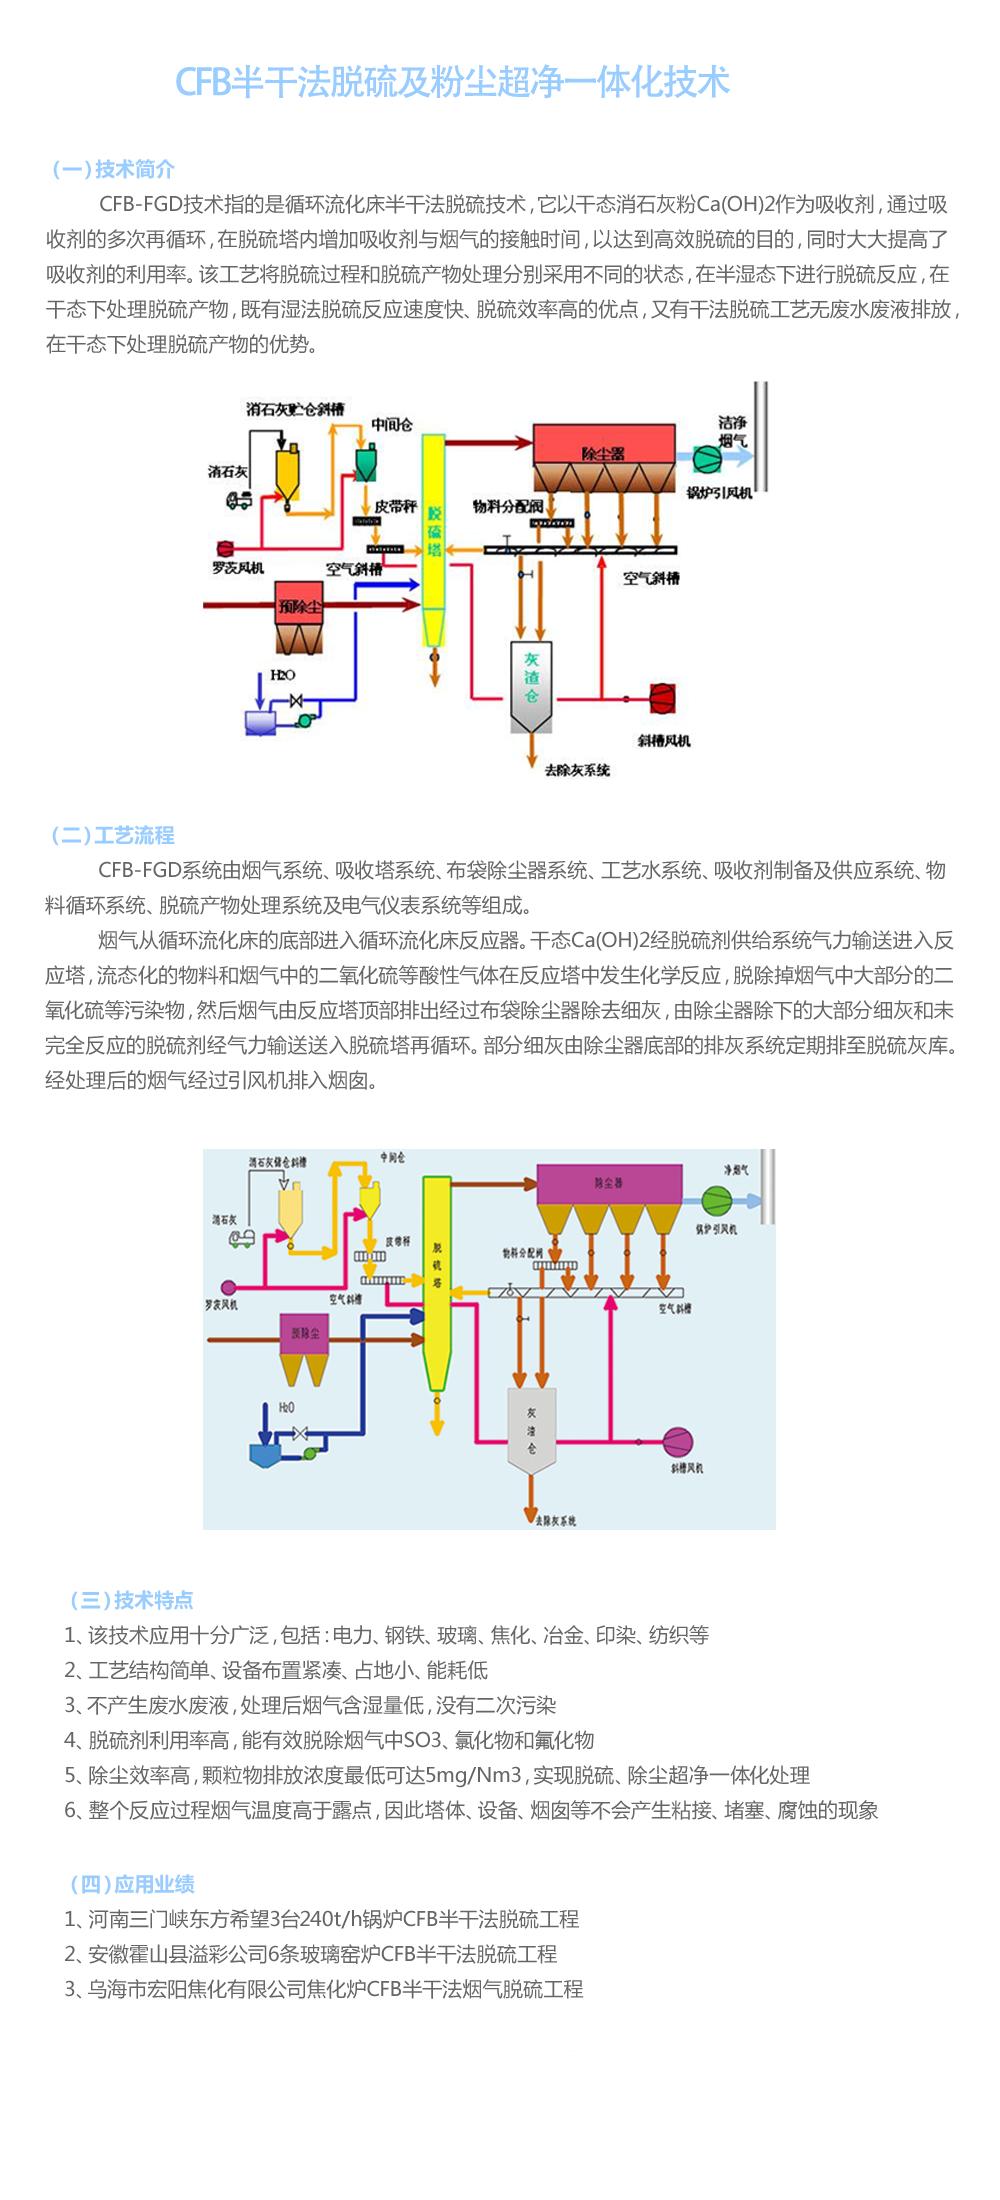 CFB半干法脱硫及粉尘超净一体化技术